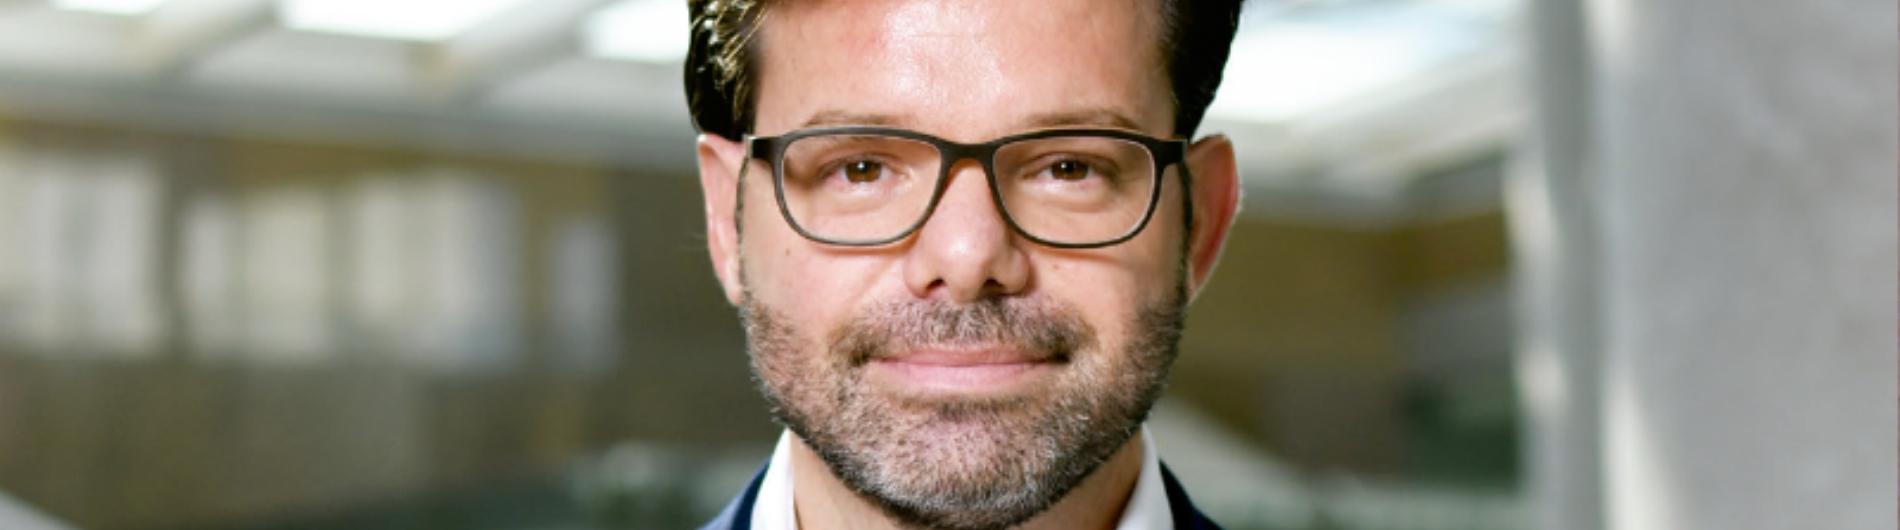 Mauricio Doehner